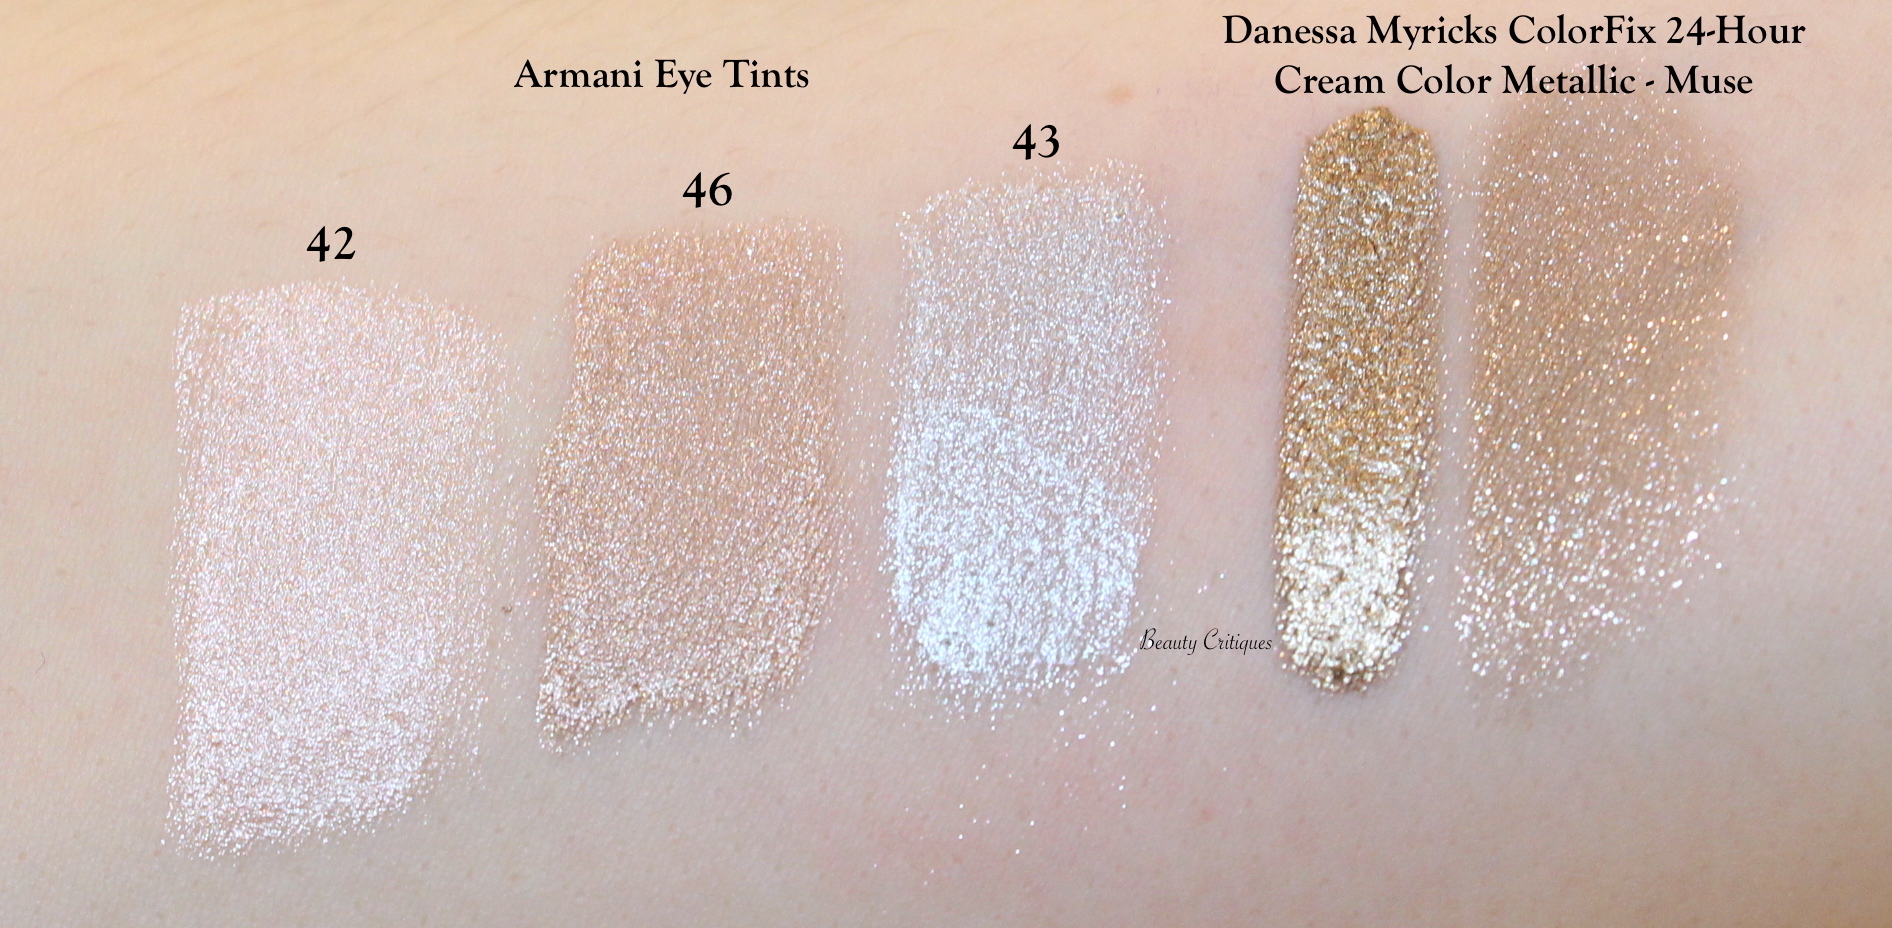 Armani Eye Tints 42, 43 & 46, Danessa Myricks ColorFix 24-hour cream colour metallic, shade Muse